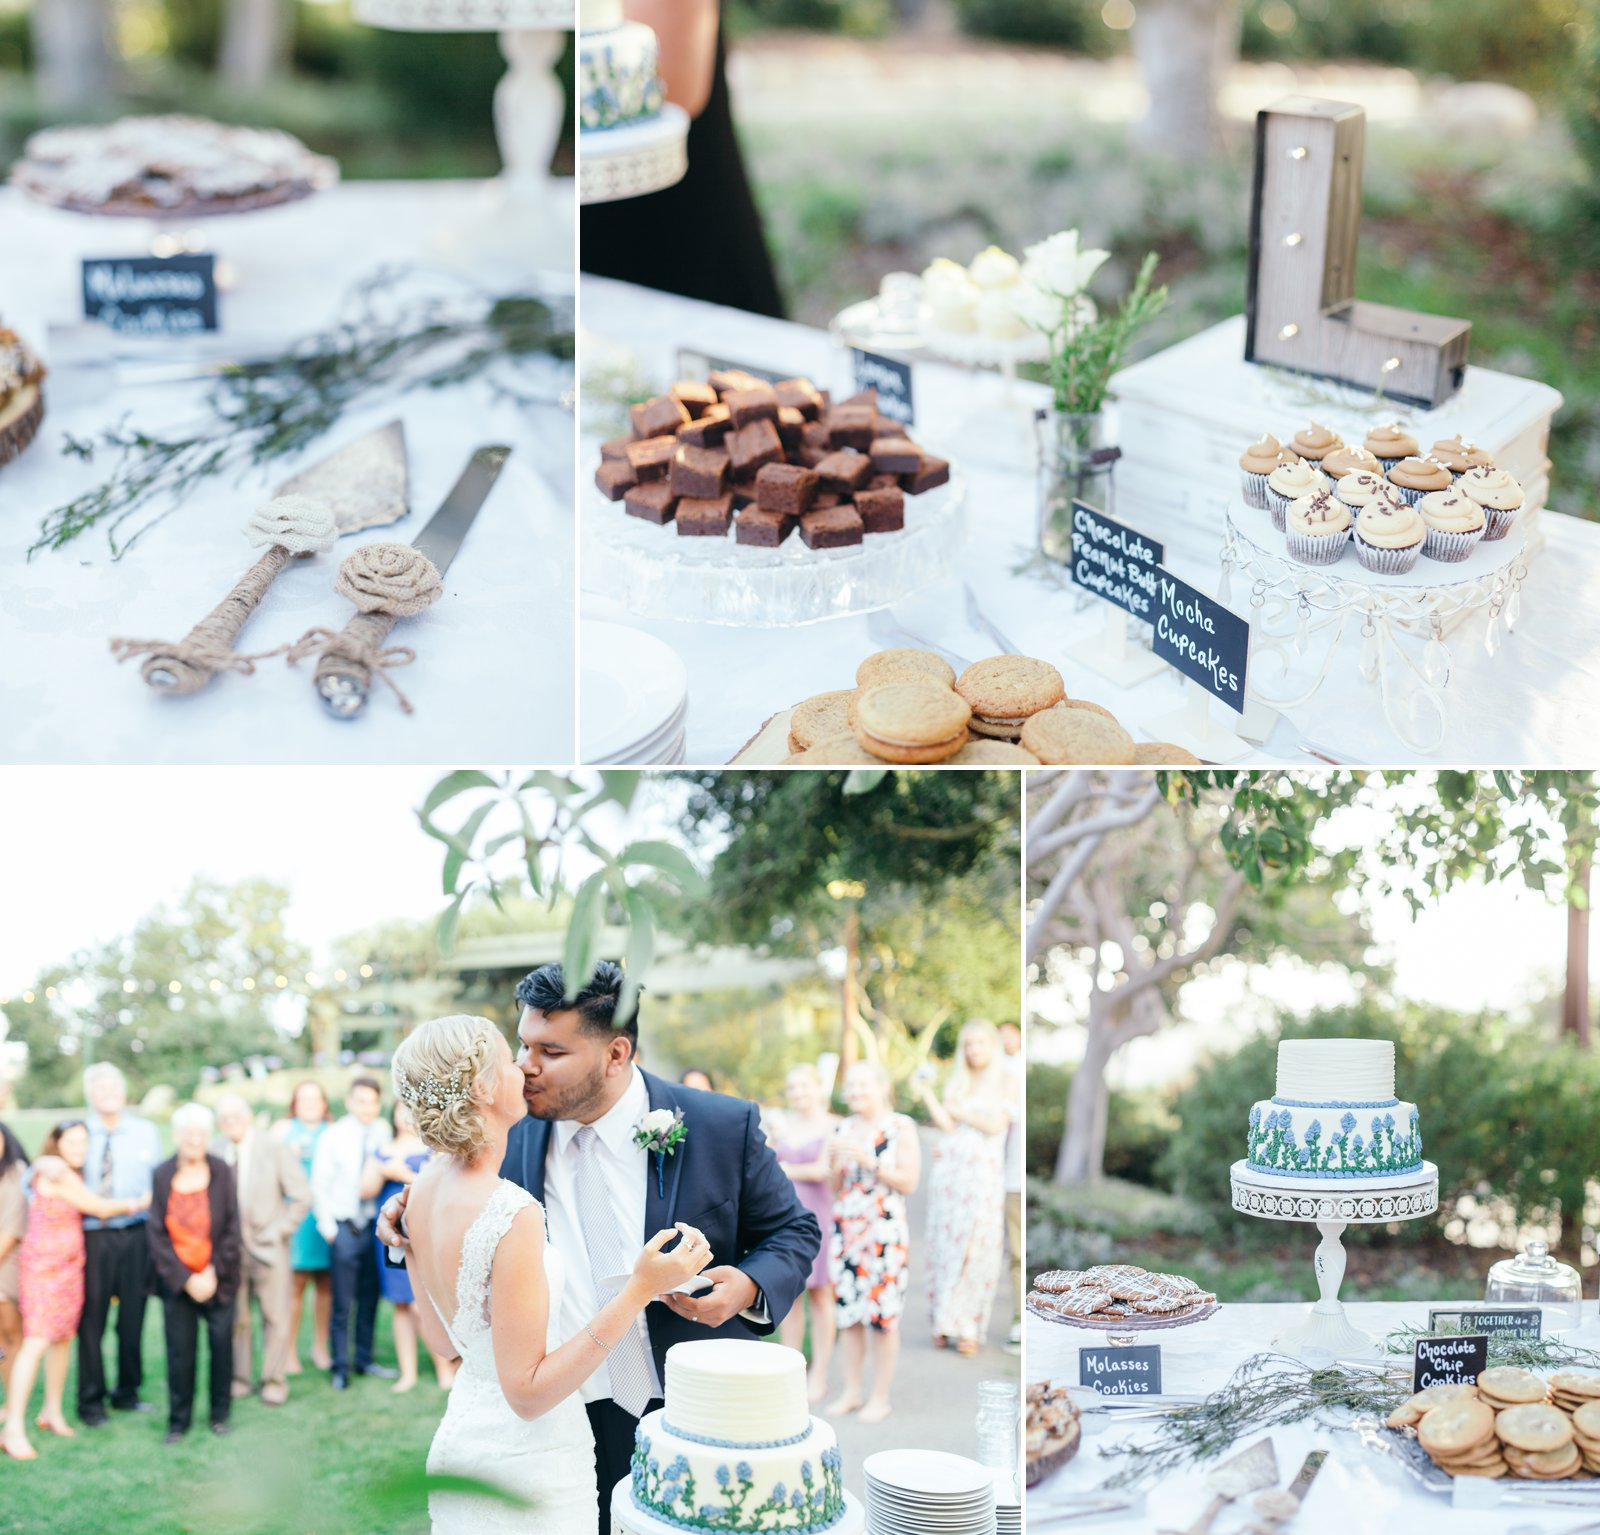 Bride and gooms cake cutting and desert design at Godric Grove Wedding.